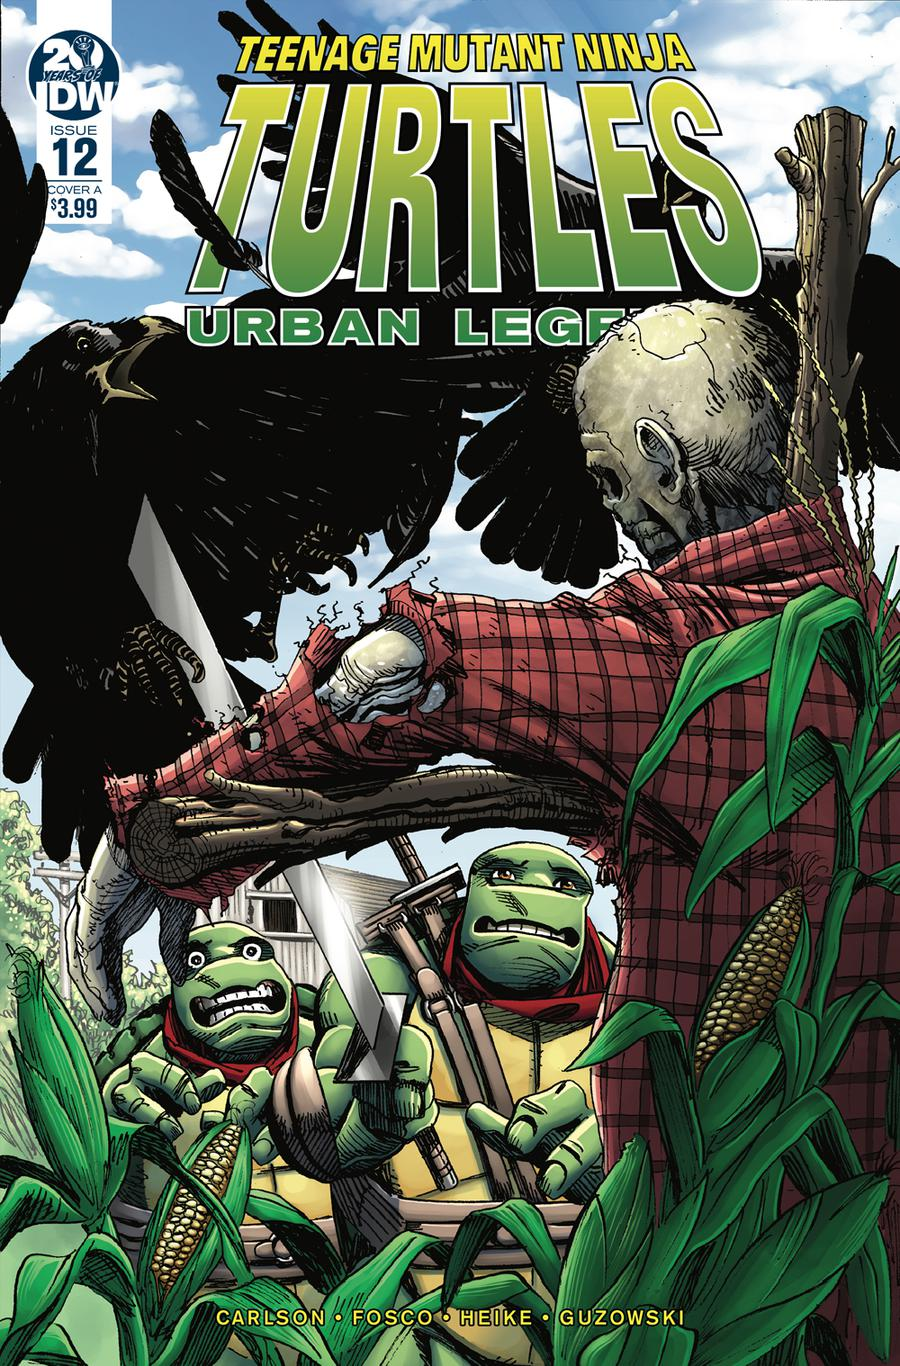 Teenage Mutant Ninja Turtles Urban Legends #12 Cover A Regular Frank Fosco Cover